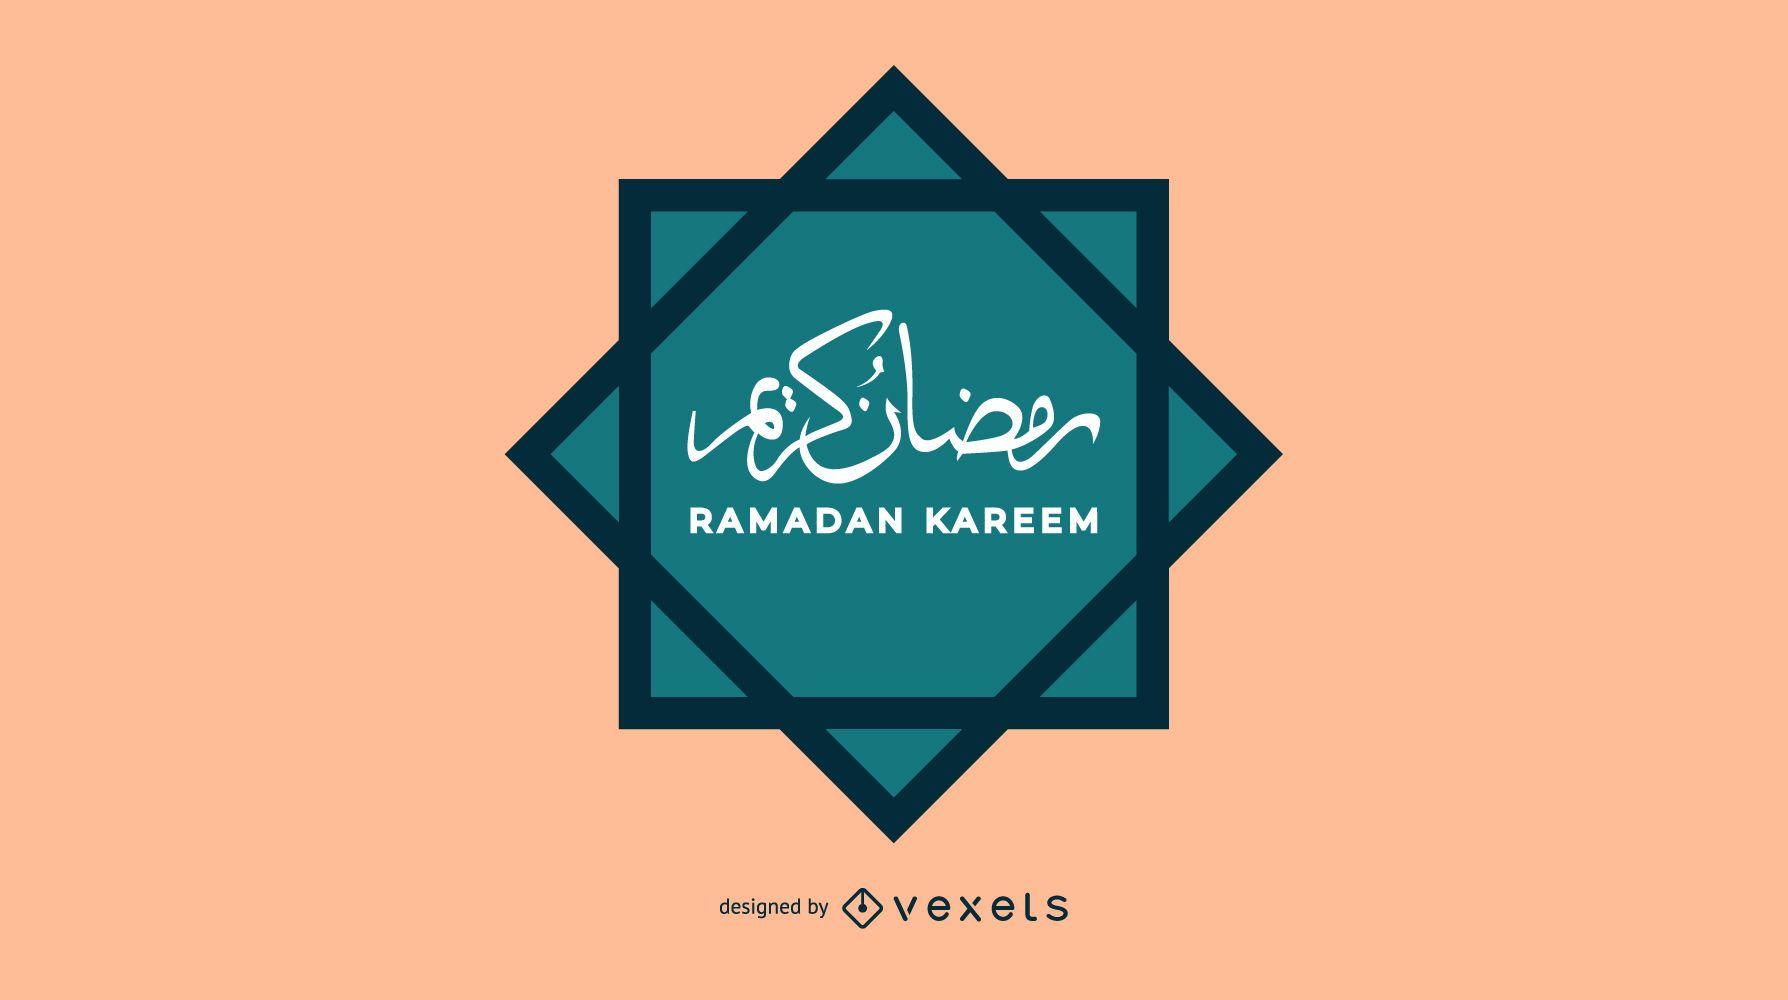 Diseño árabe de Ramadán Kareem